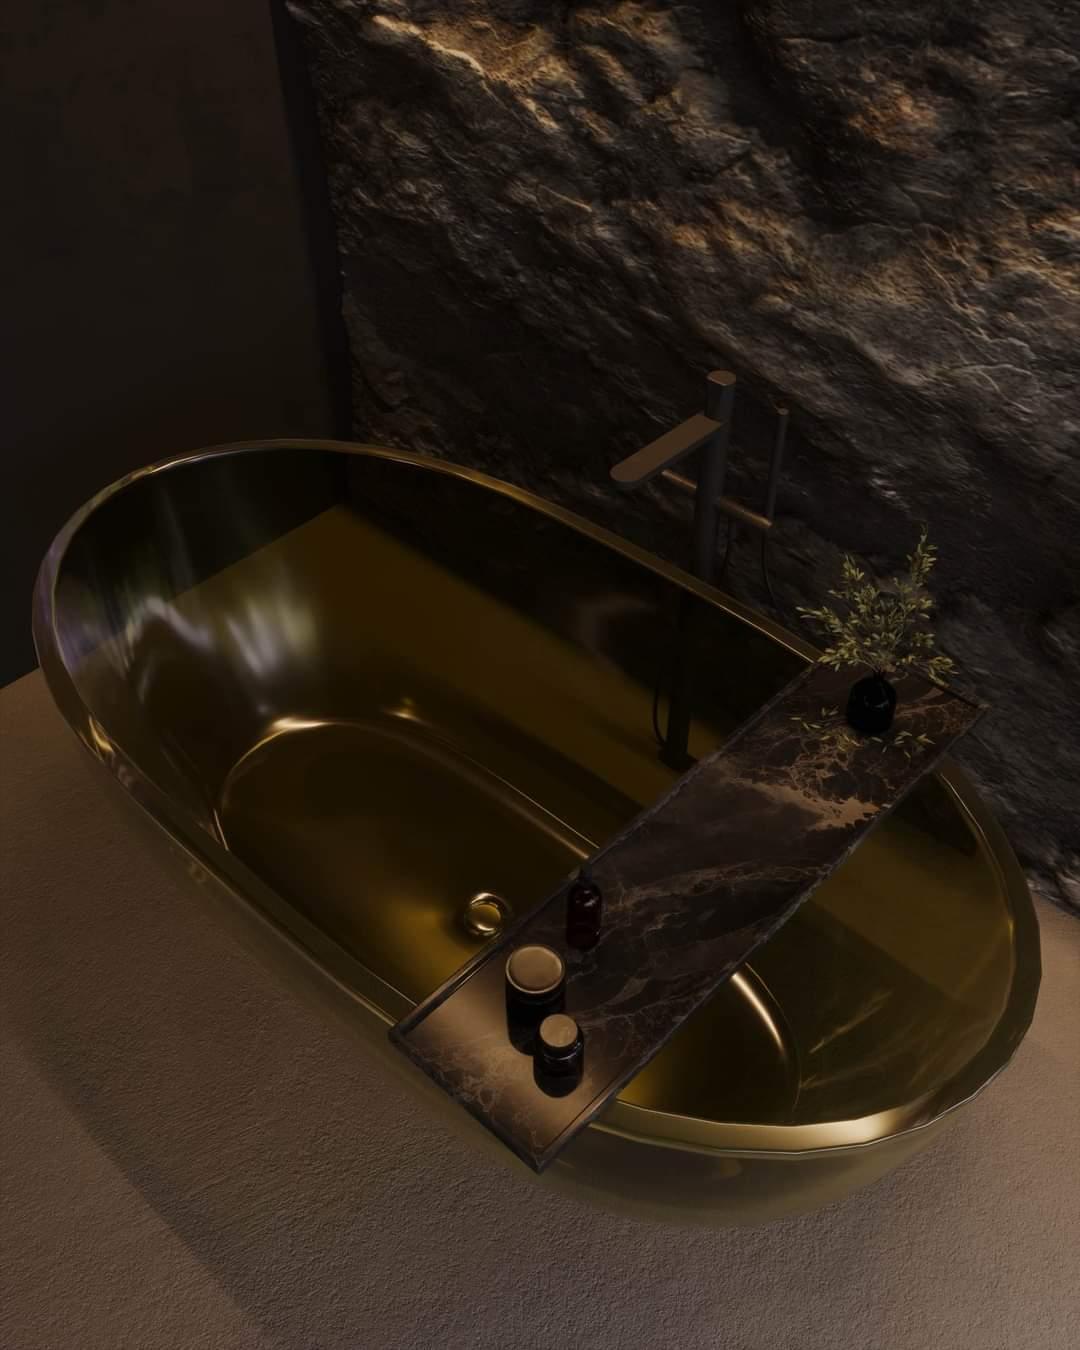 Awesome Bath Tub - Source: Kireevaaanna